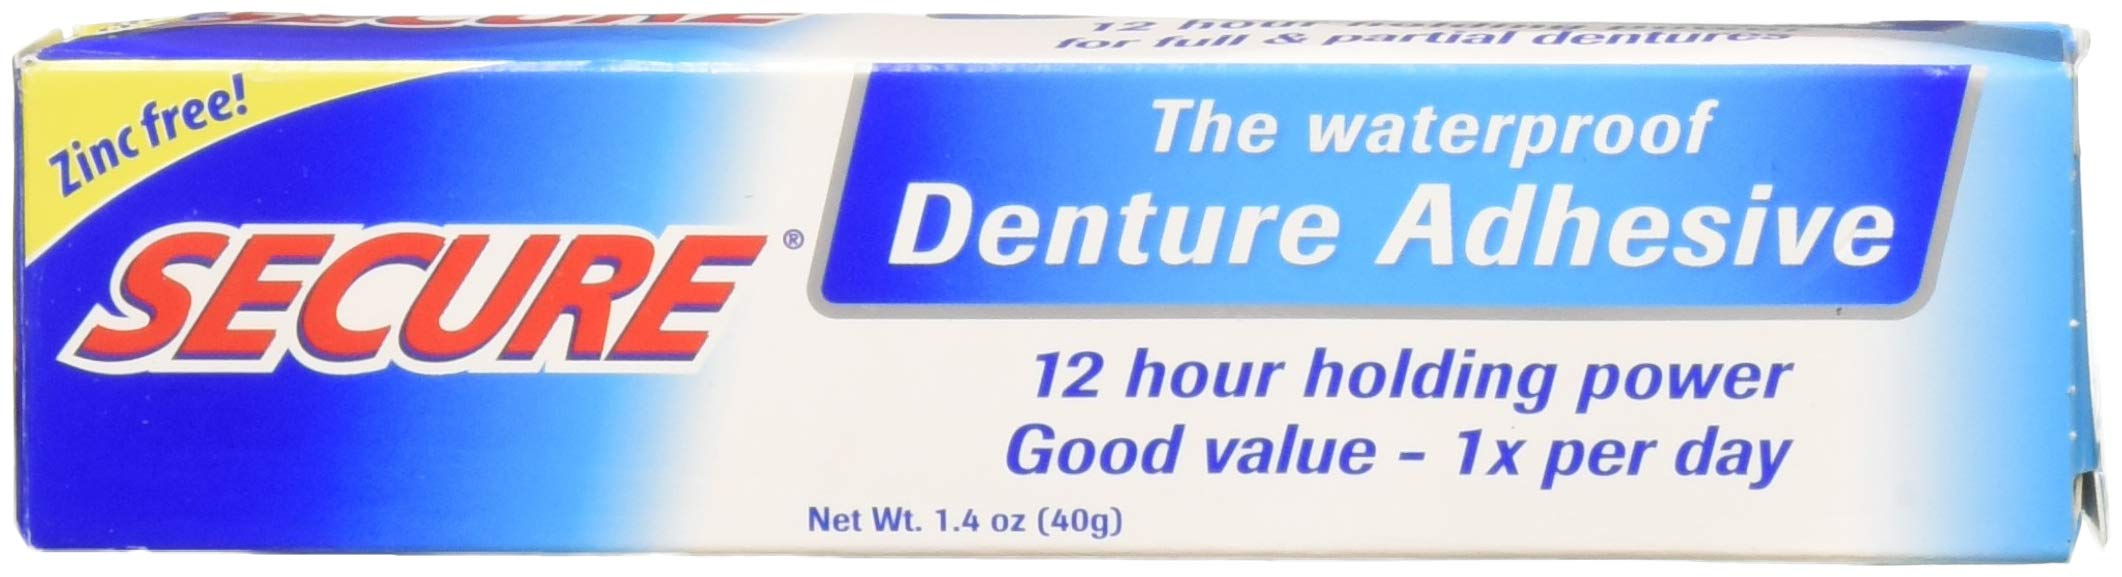 Secure Denture Adhesive >> Secure Denture Adhesive 40g